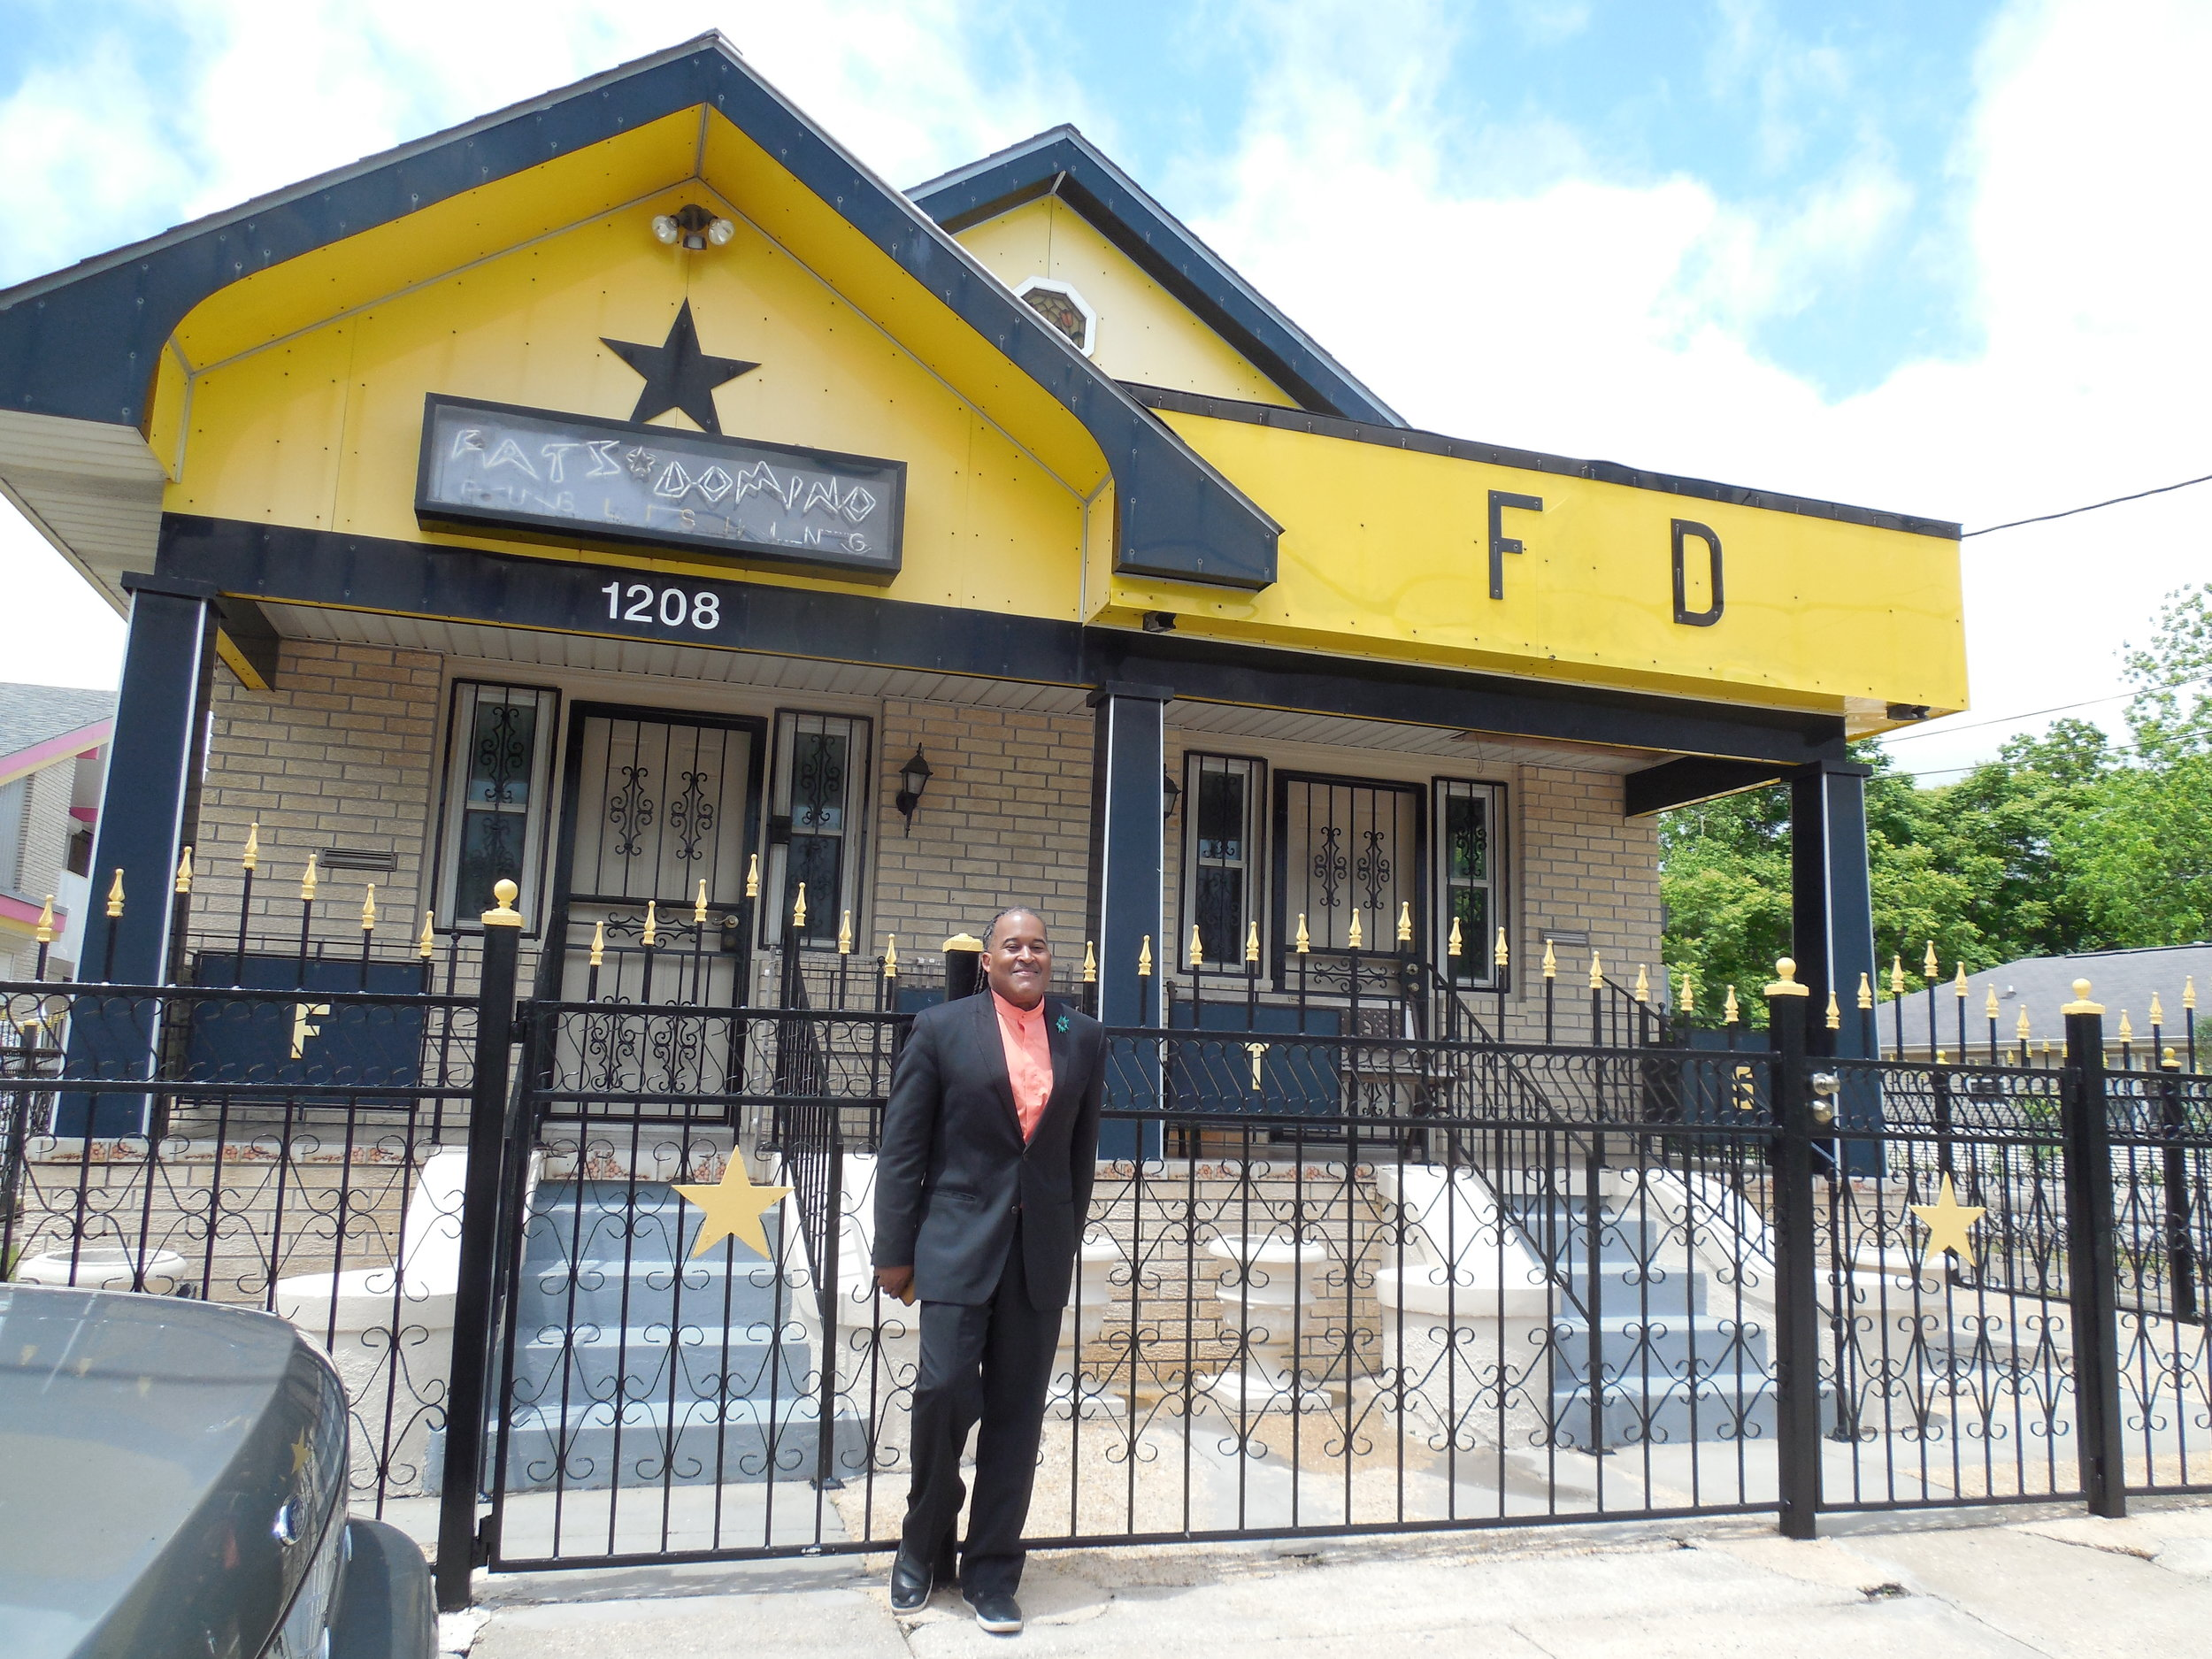 JB Jonathan Singleton at Fat's Domino's house in the 9th Ward